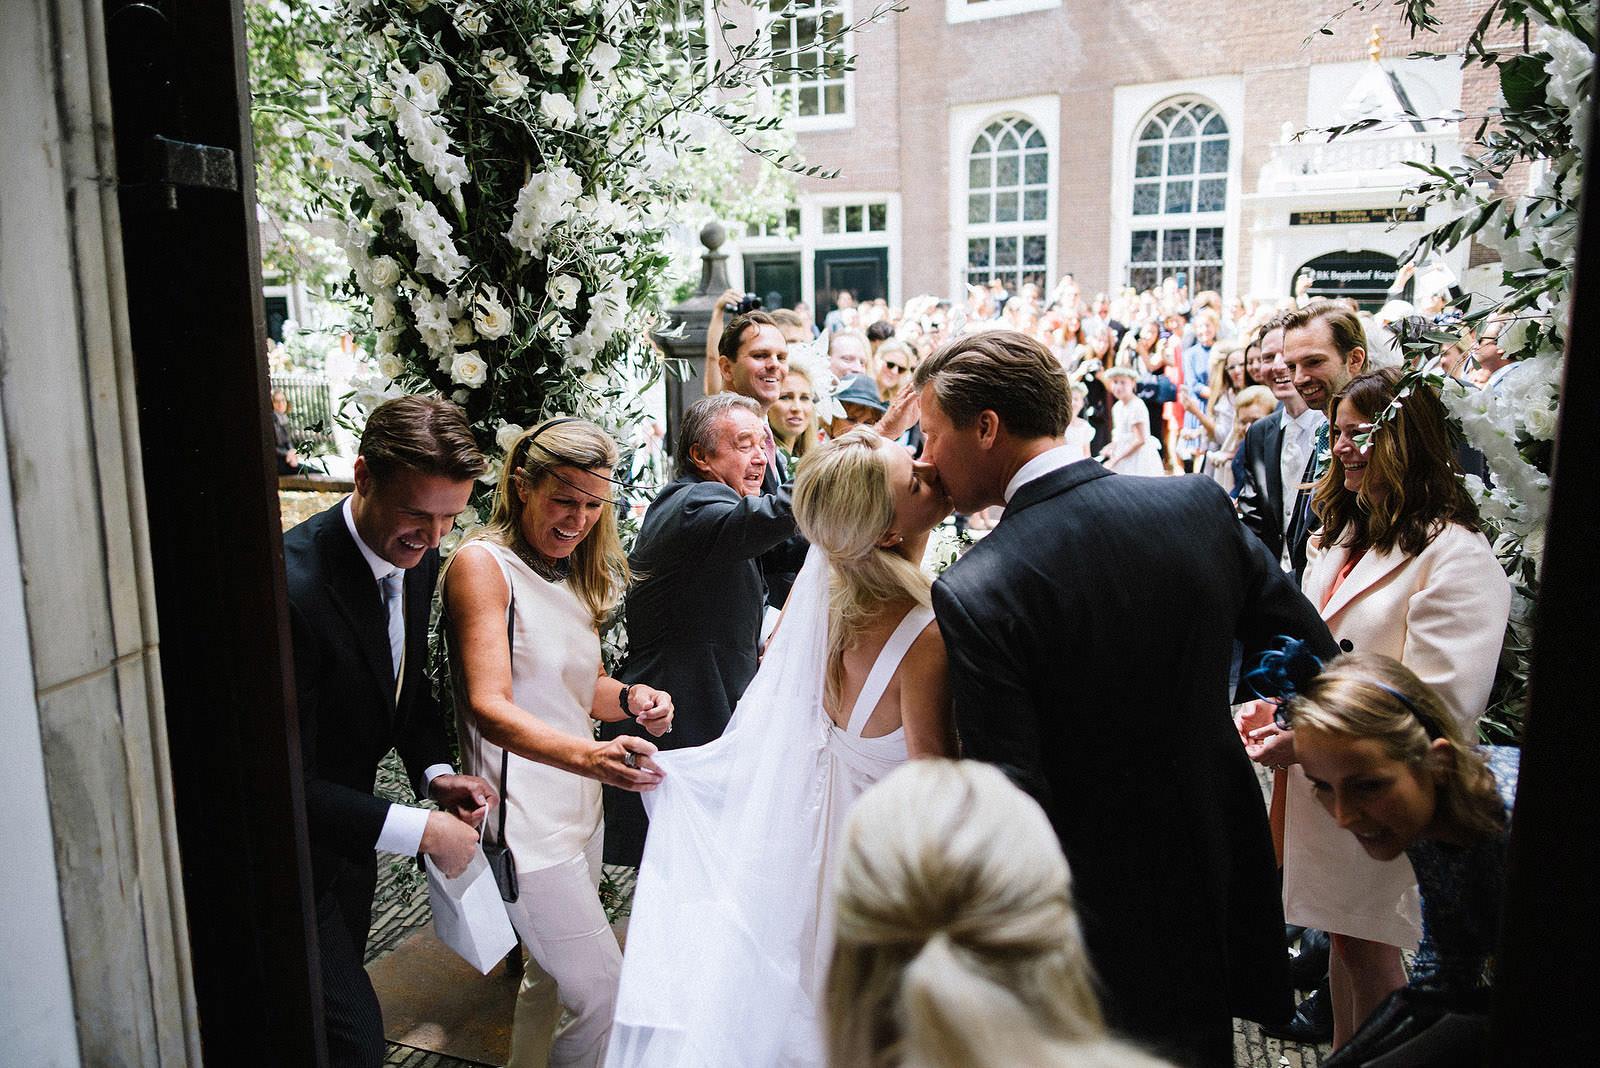 Fotograf Konstanz - Destination Wedding Photographer Amsterdam 043 - Destination Wedding Amsterdam  - 152 -